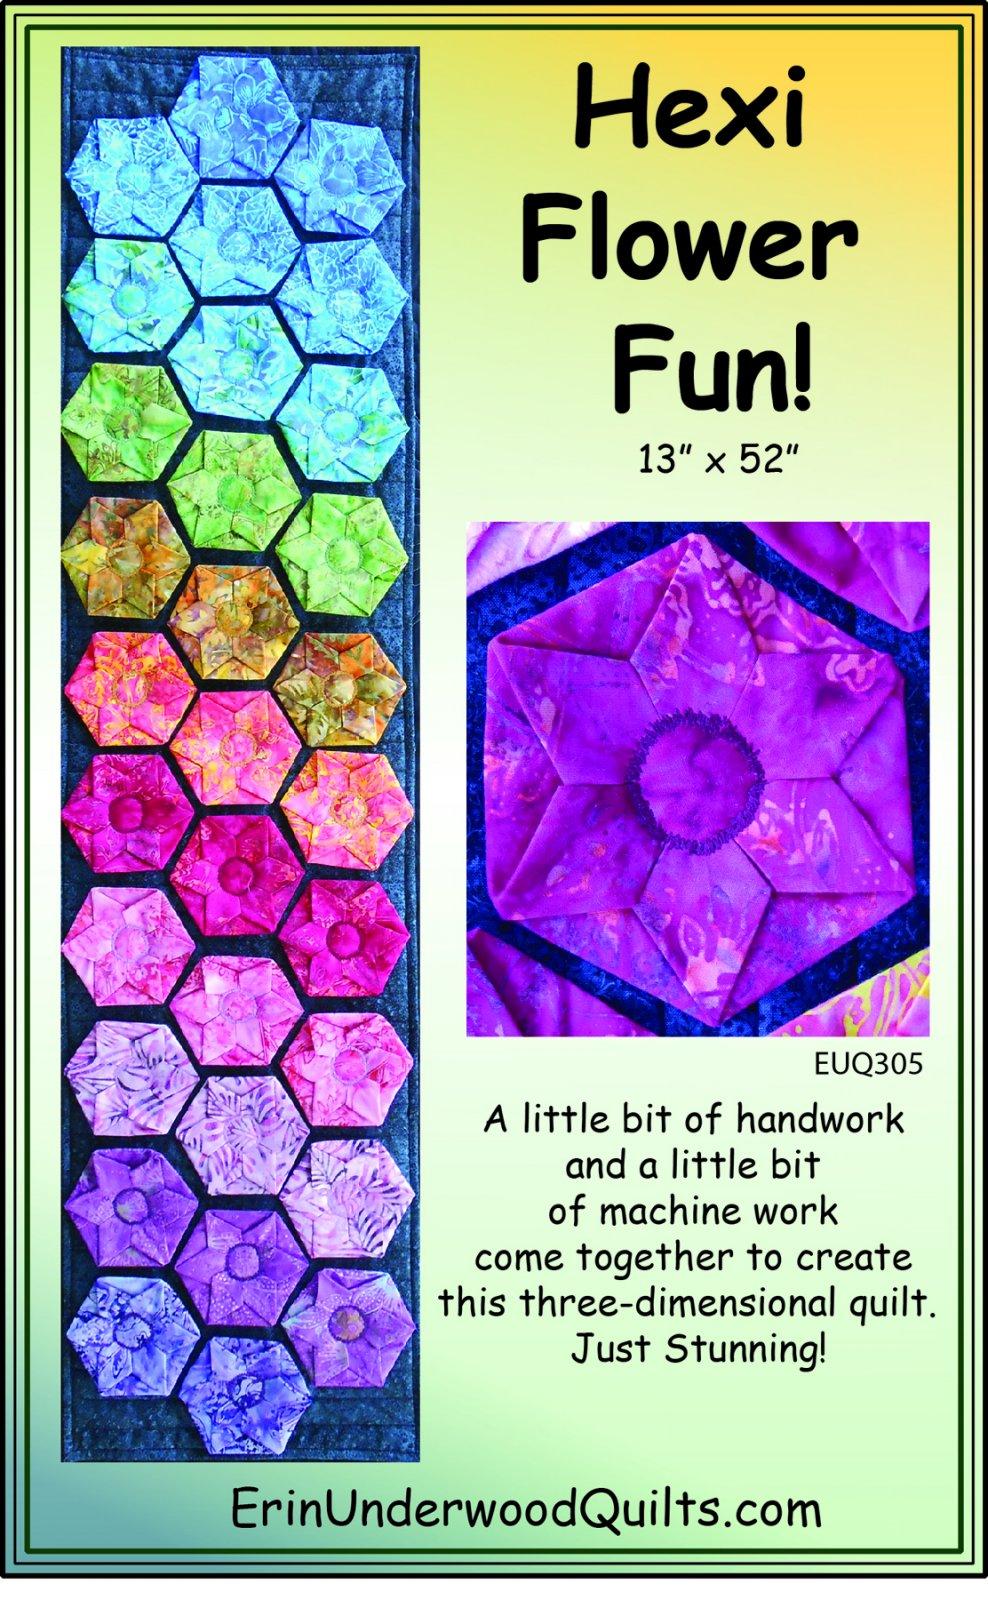 Hexi Flower Fun!